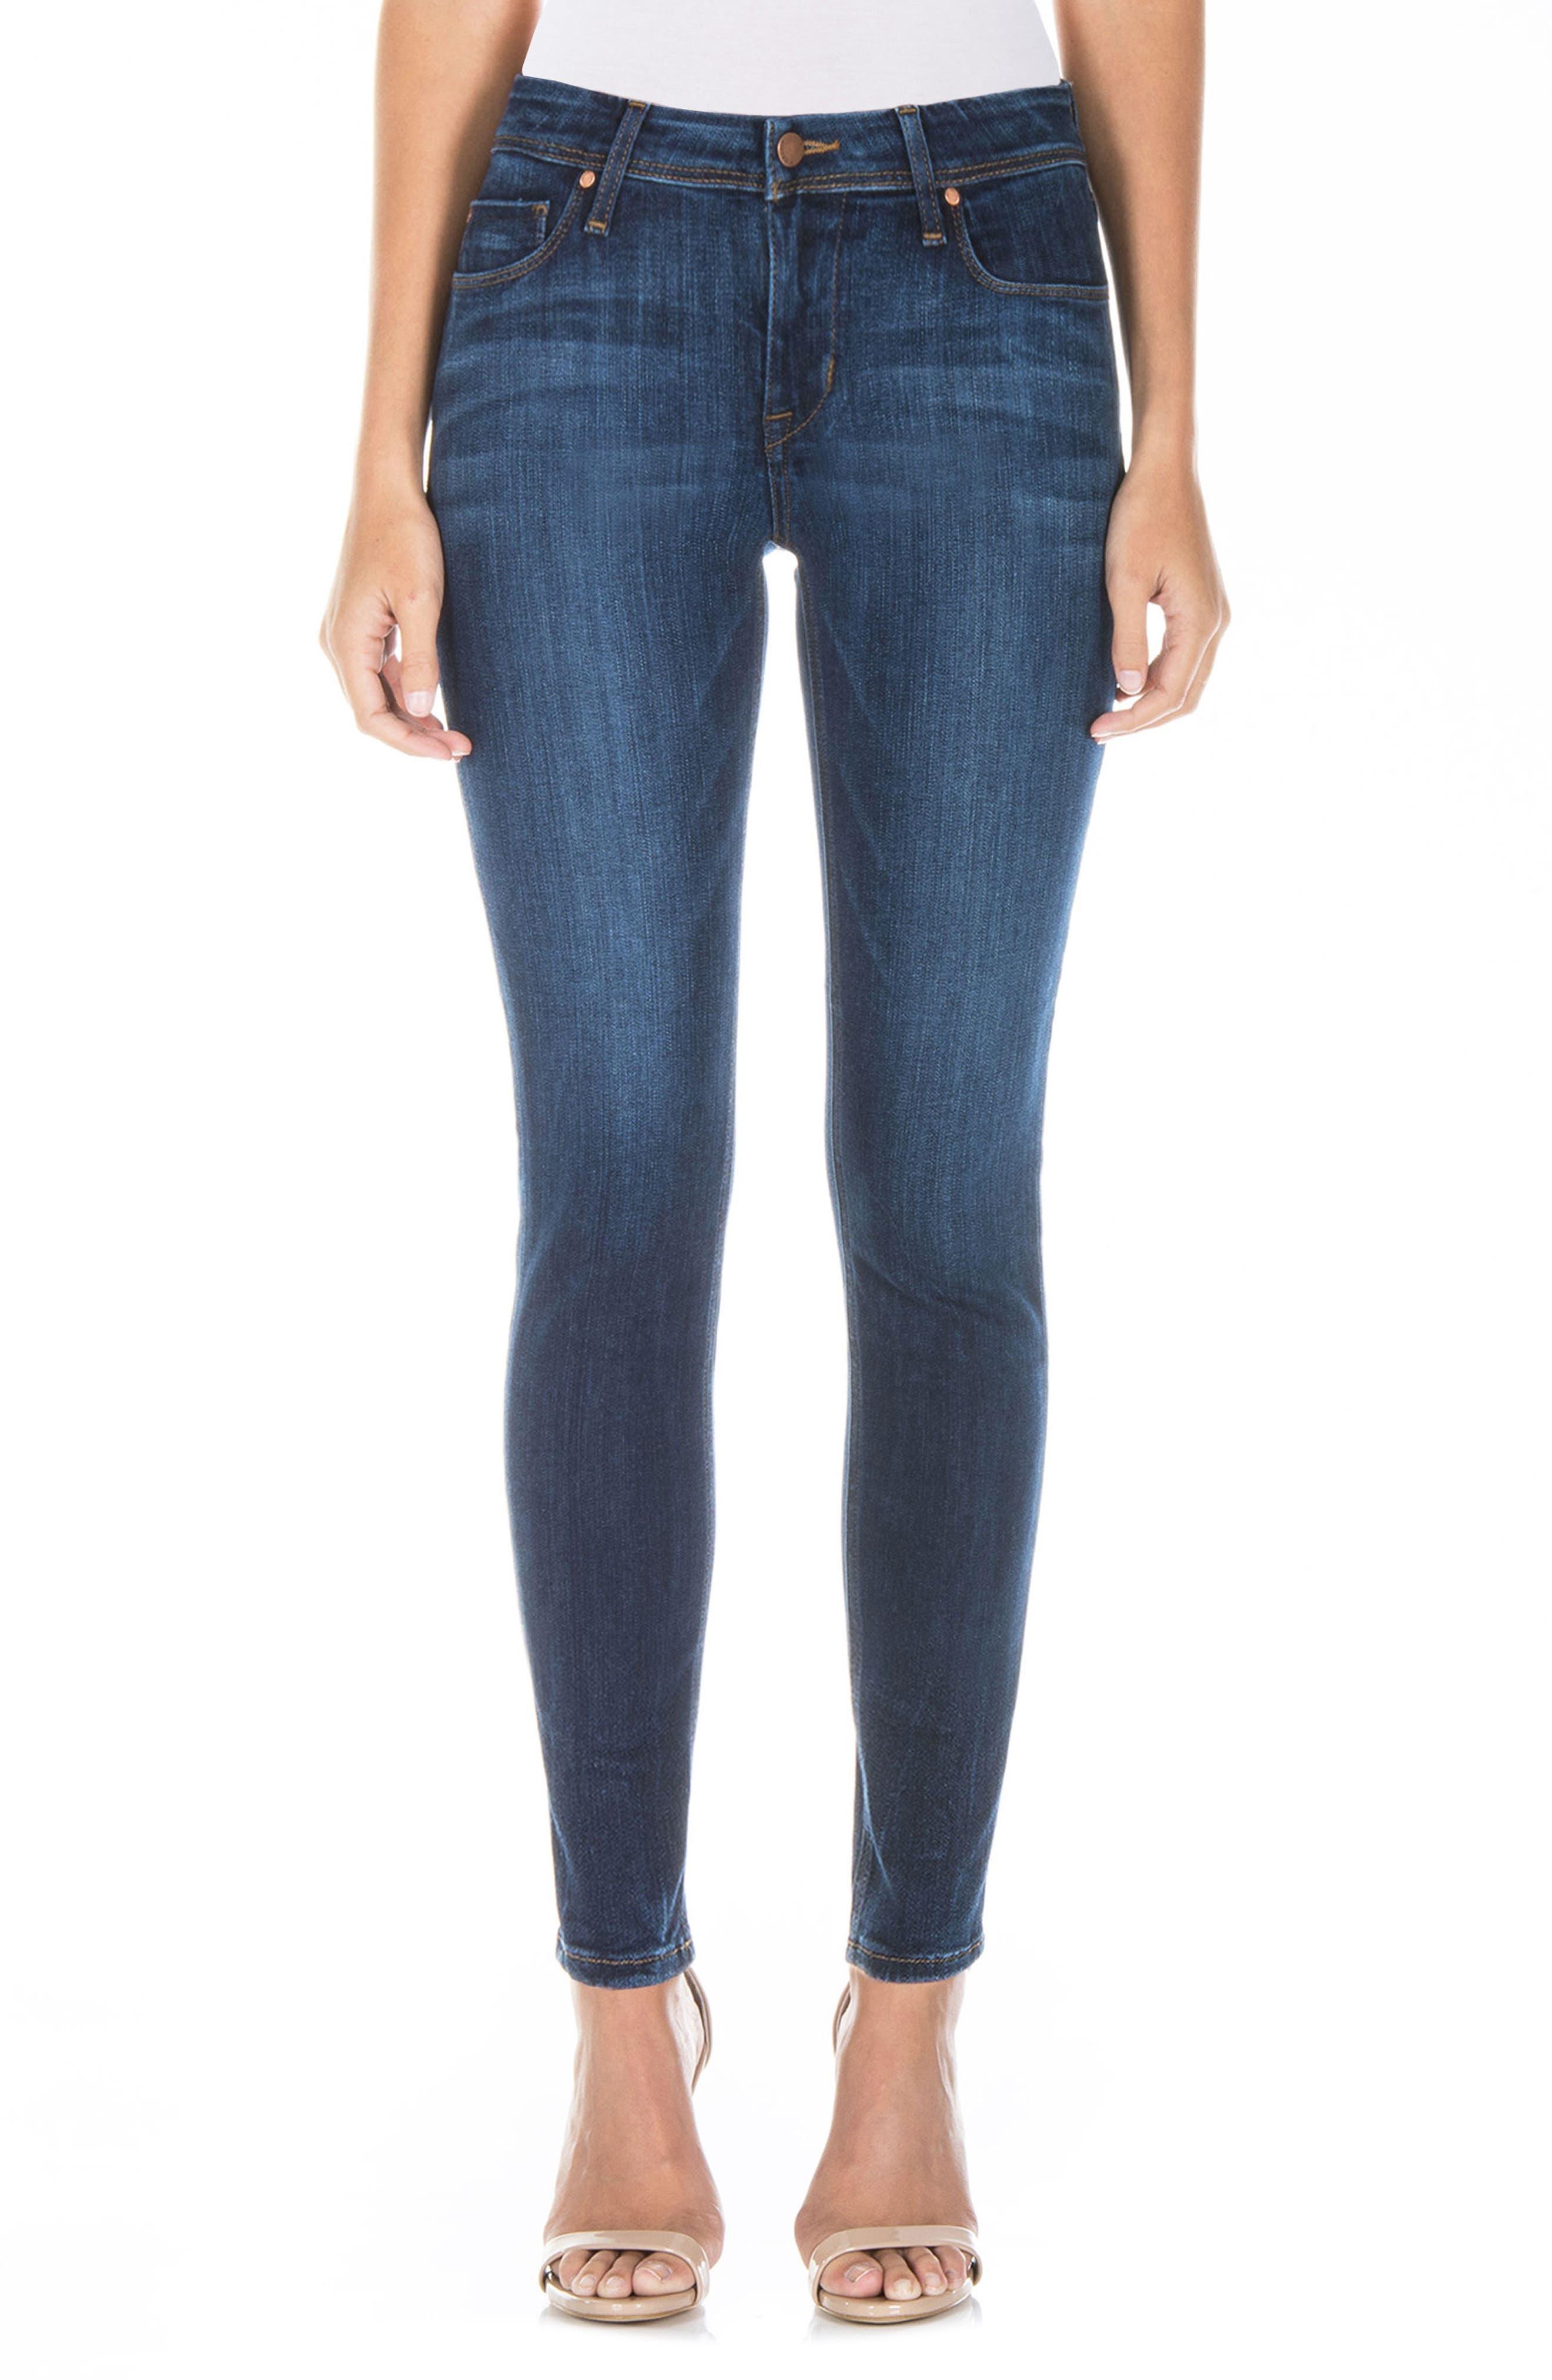 Gwen High Waist Skinny Jeans,                             Main thumbnail 1, color,                             400